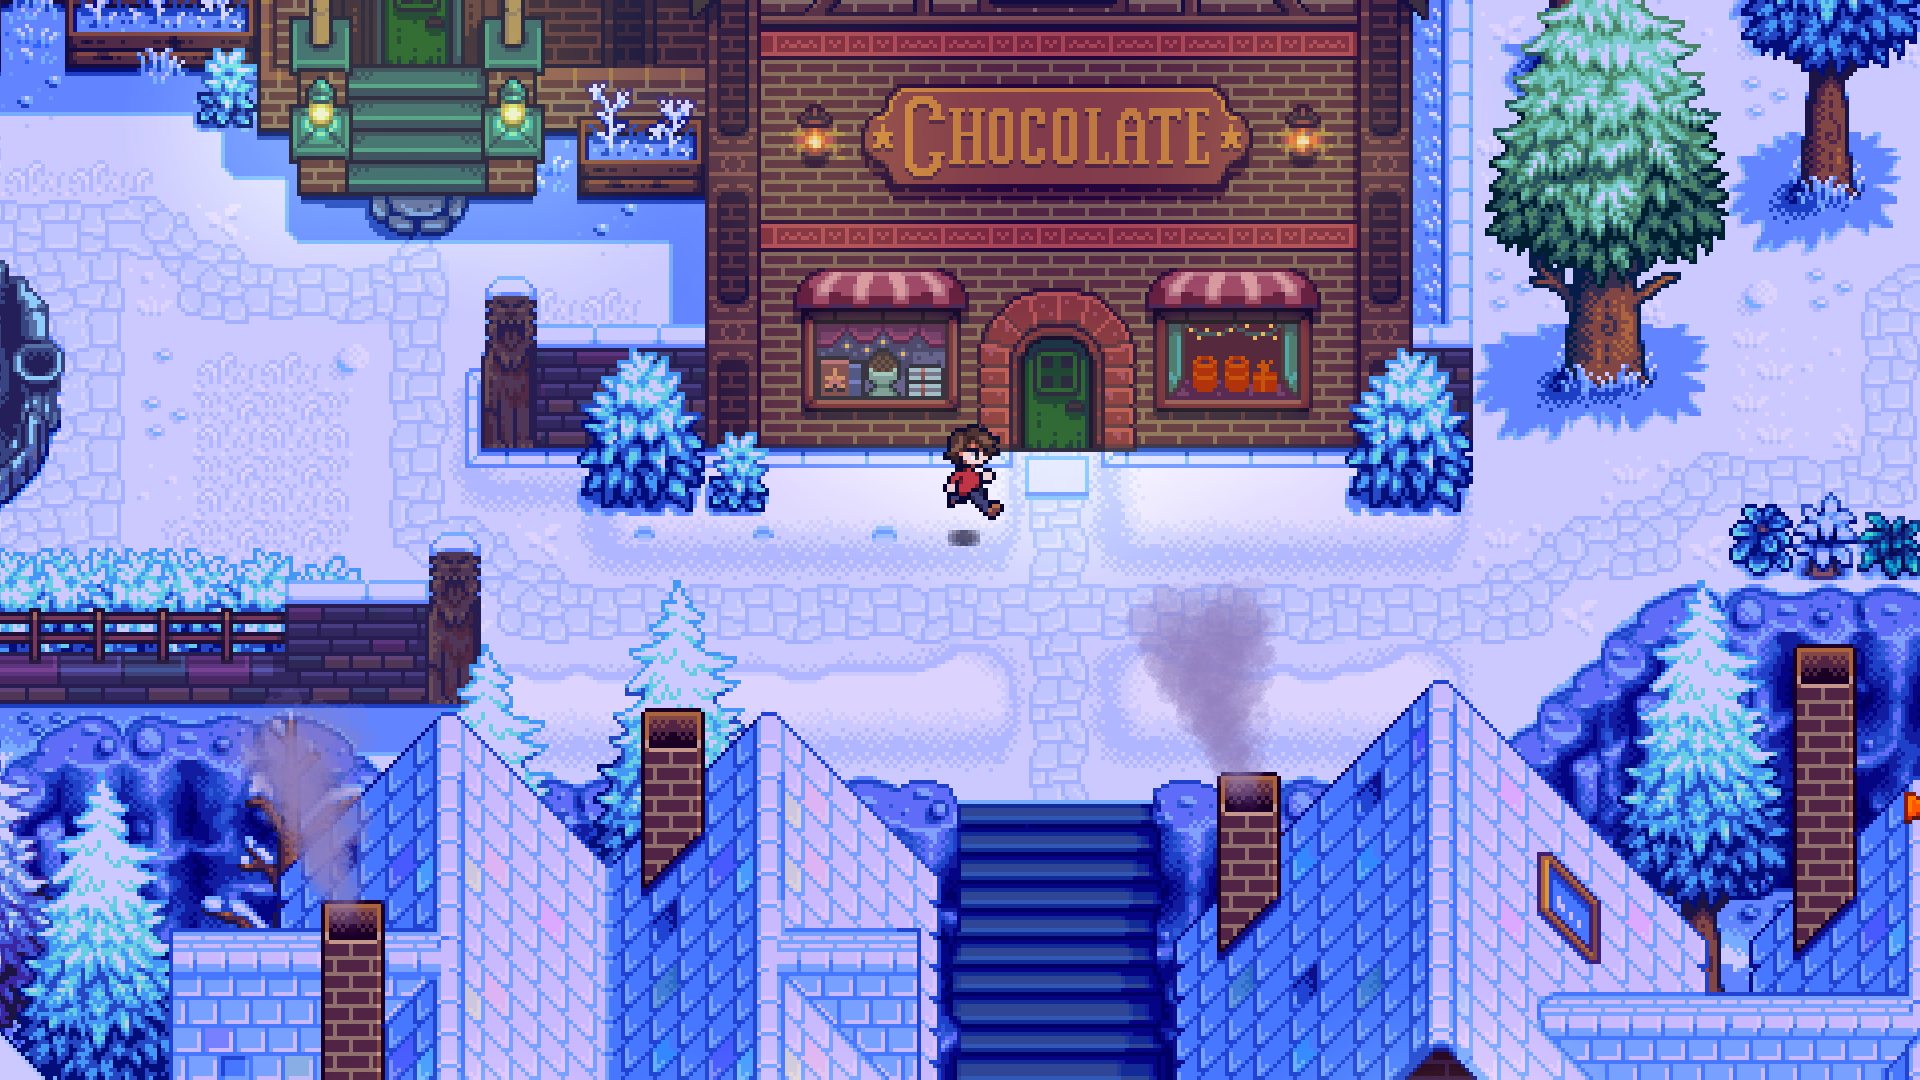 Haunted Chocolatier เกมใหม่ของผู้พัฒนา Stardew Valley เปลี่ยนมาสร้างโรงงานช็อคโกแลต